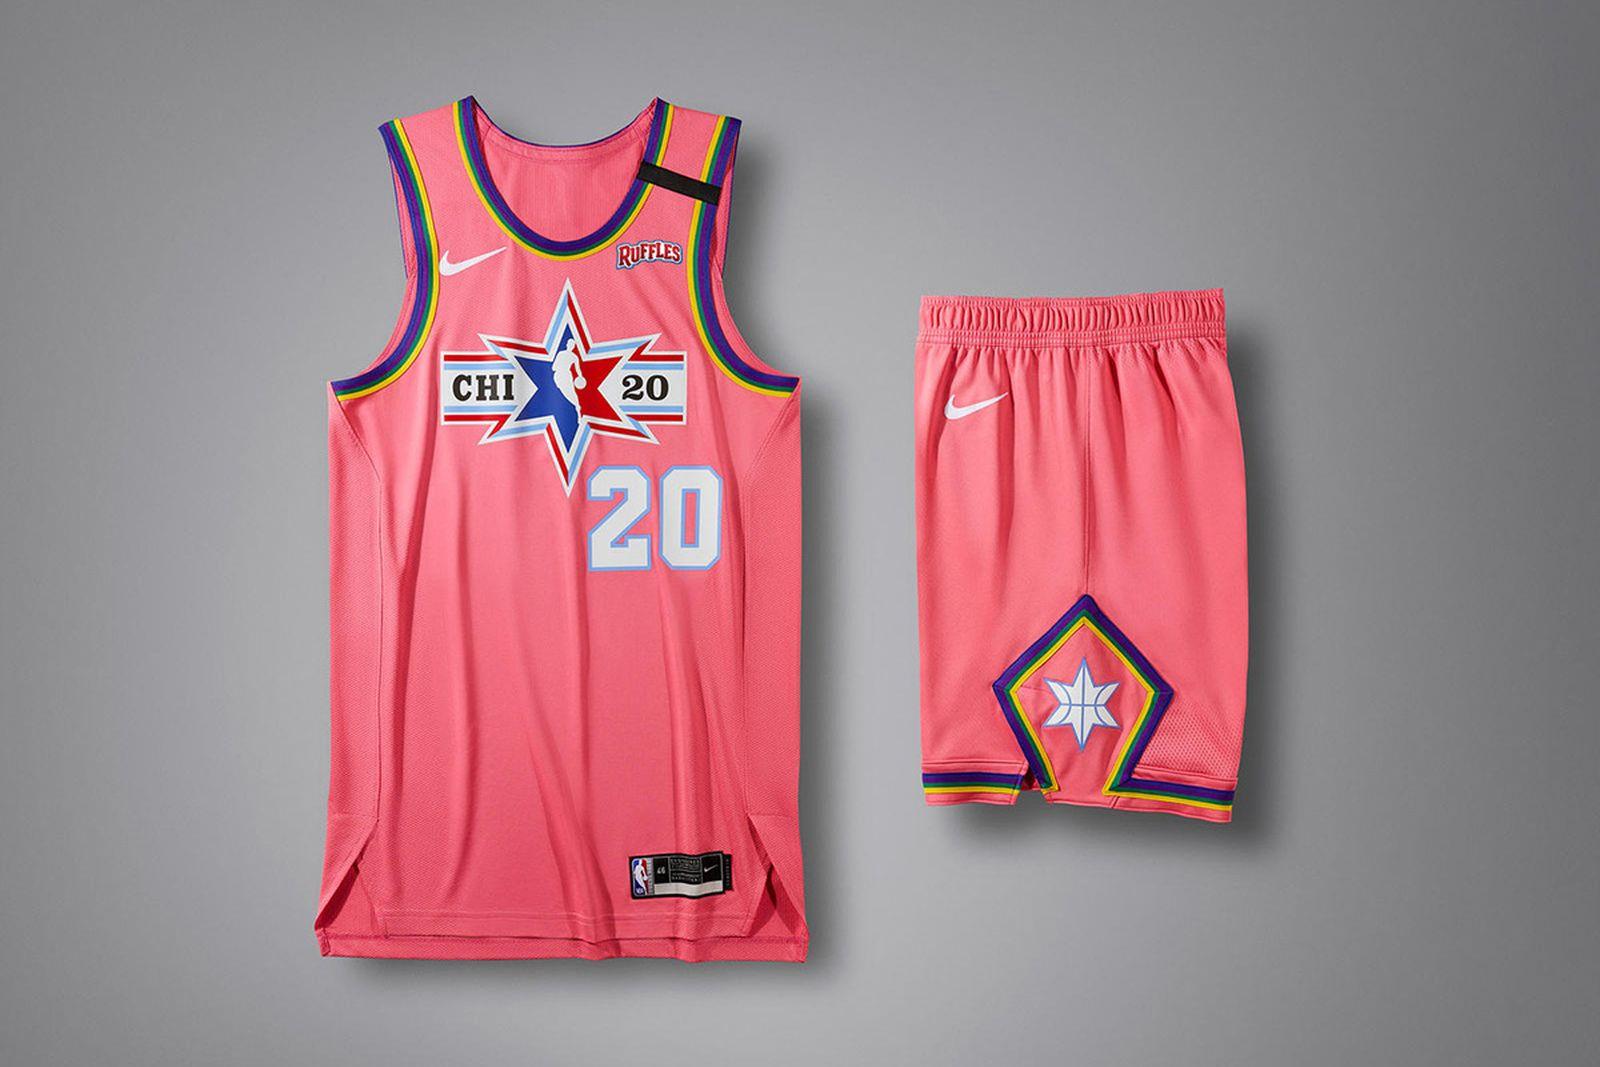 jordan-brand-nba-star-game-uniforms-04